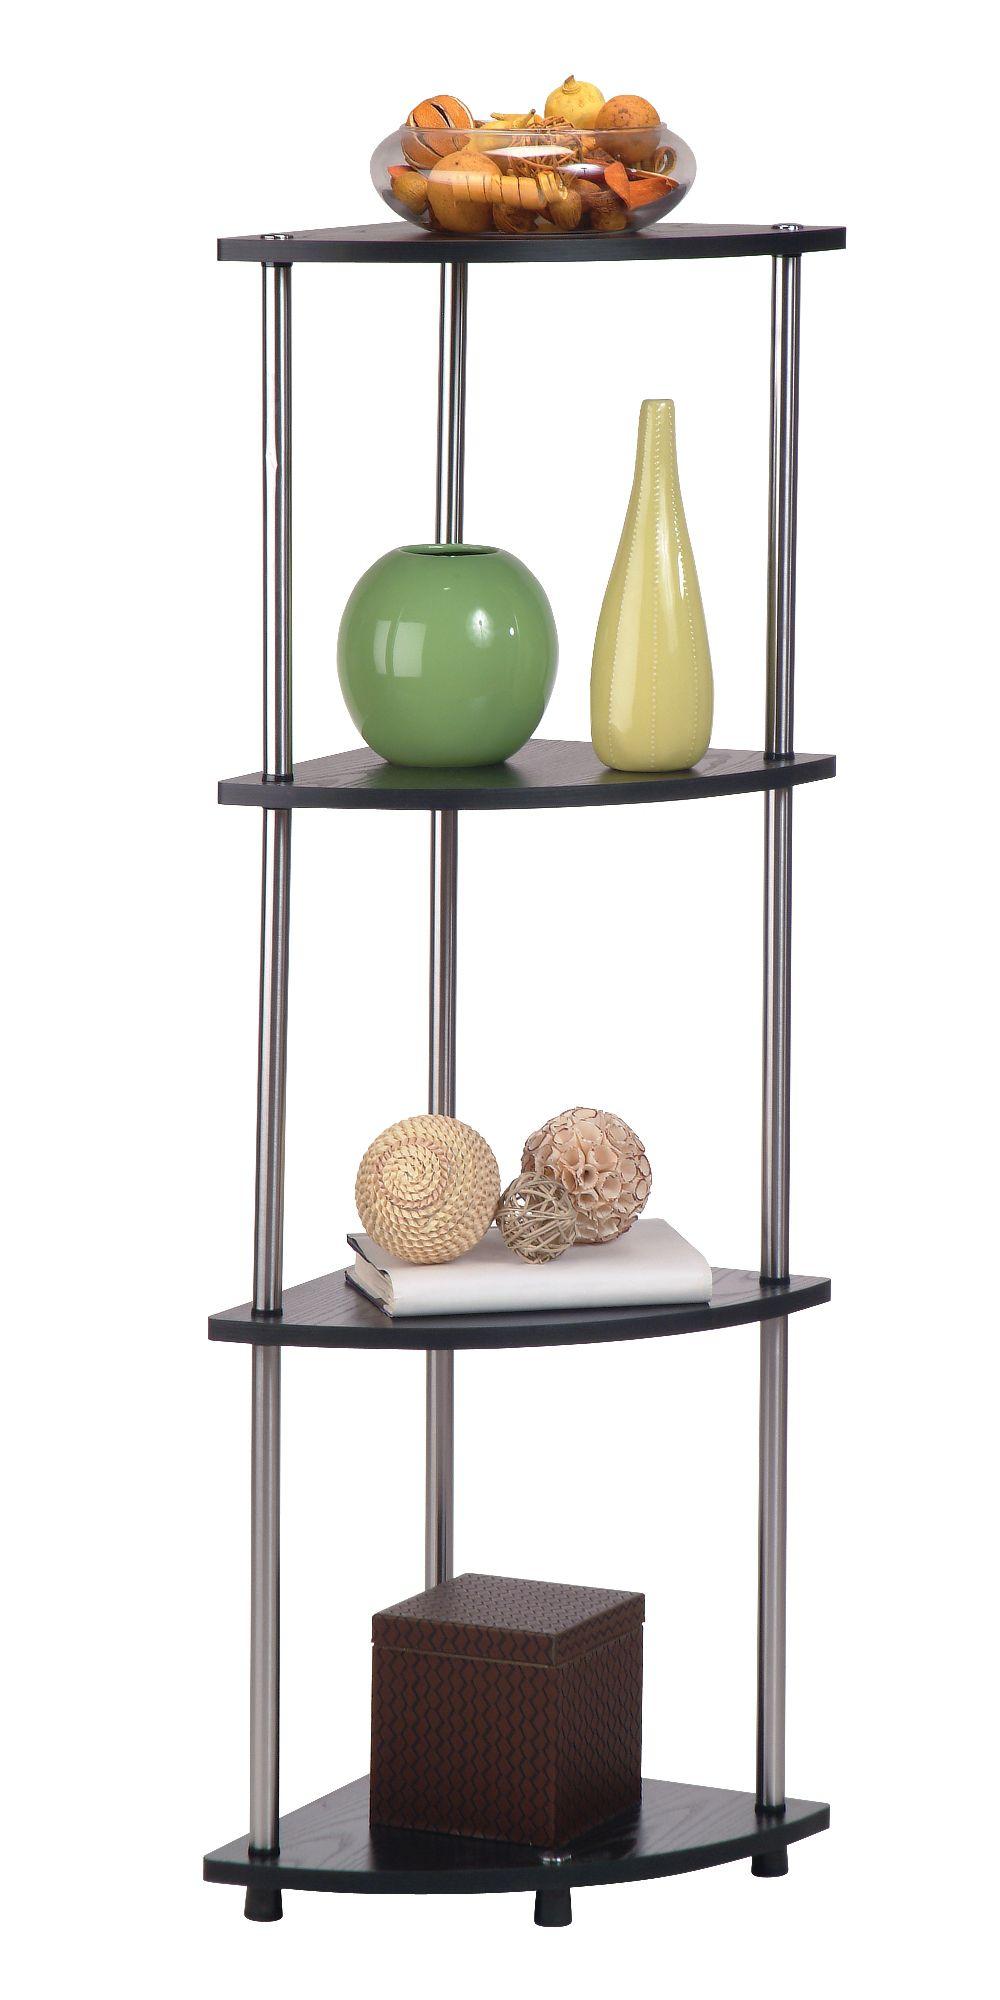 Designs2Go 4 Tier Corner Shelf by Convenience Concepts, Inc.